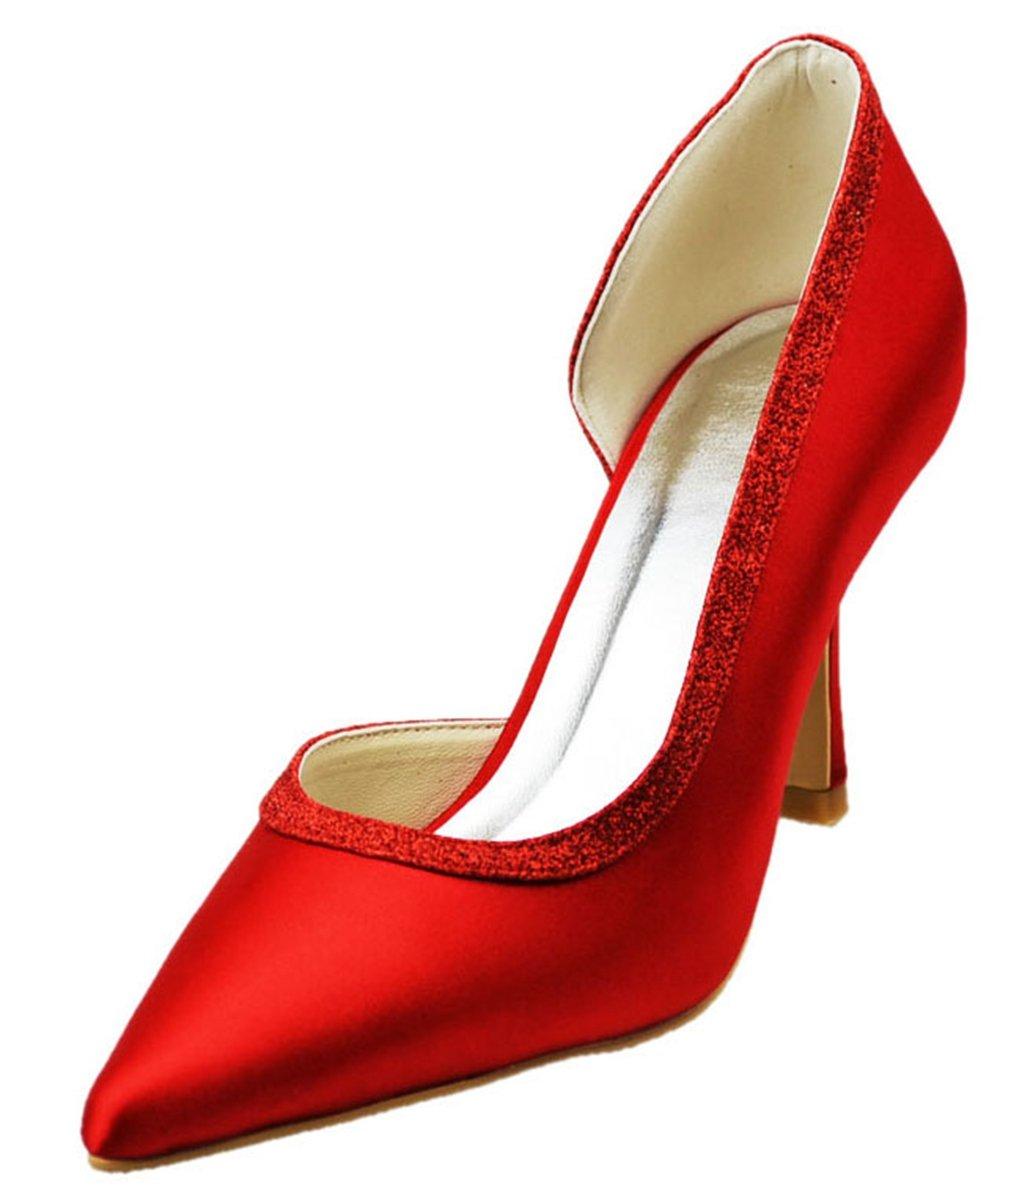 Minitoo , , Semelle Rouge compensée femme 19911 Rouge - rouge f269935 - piero.space